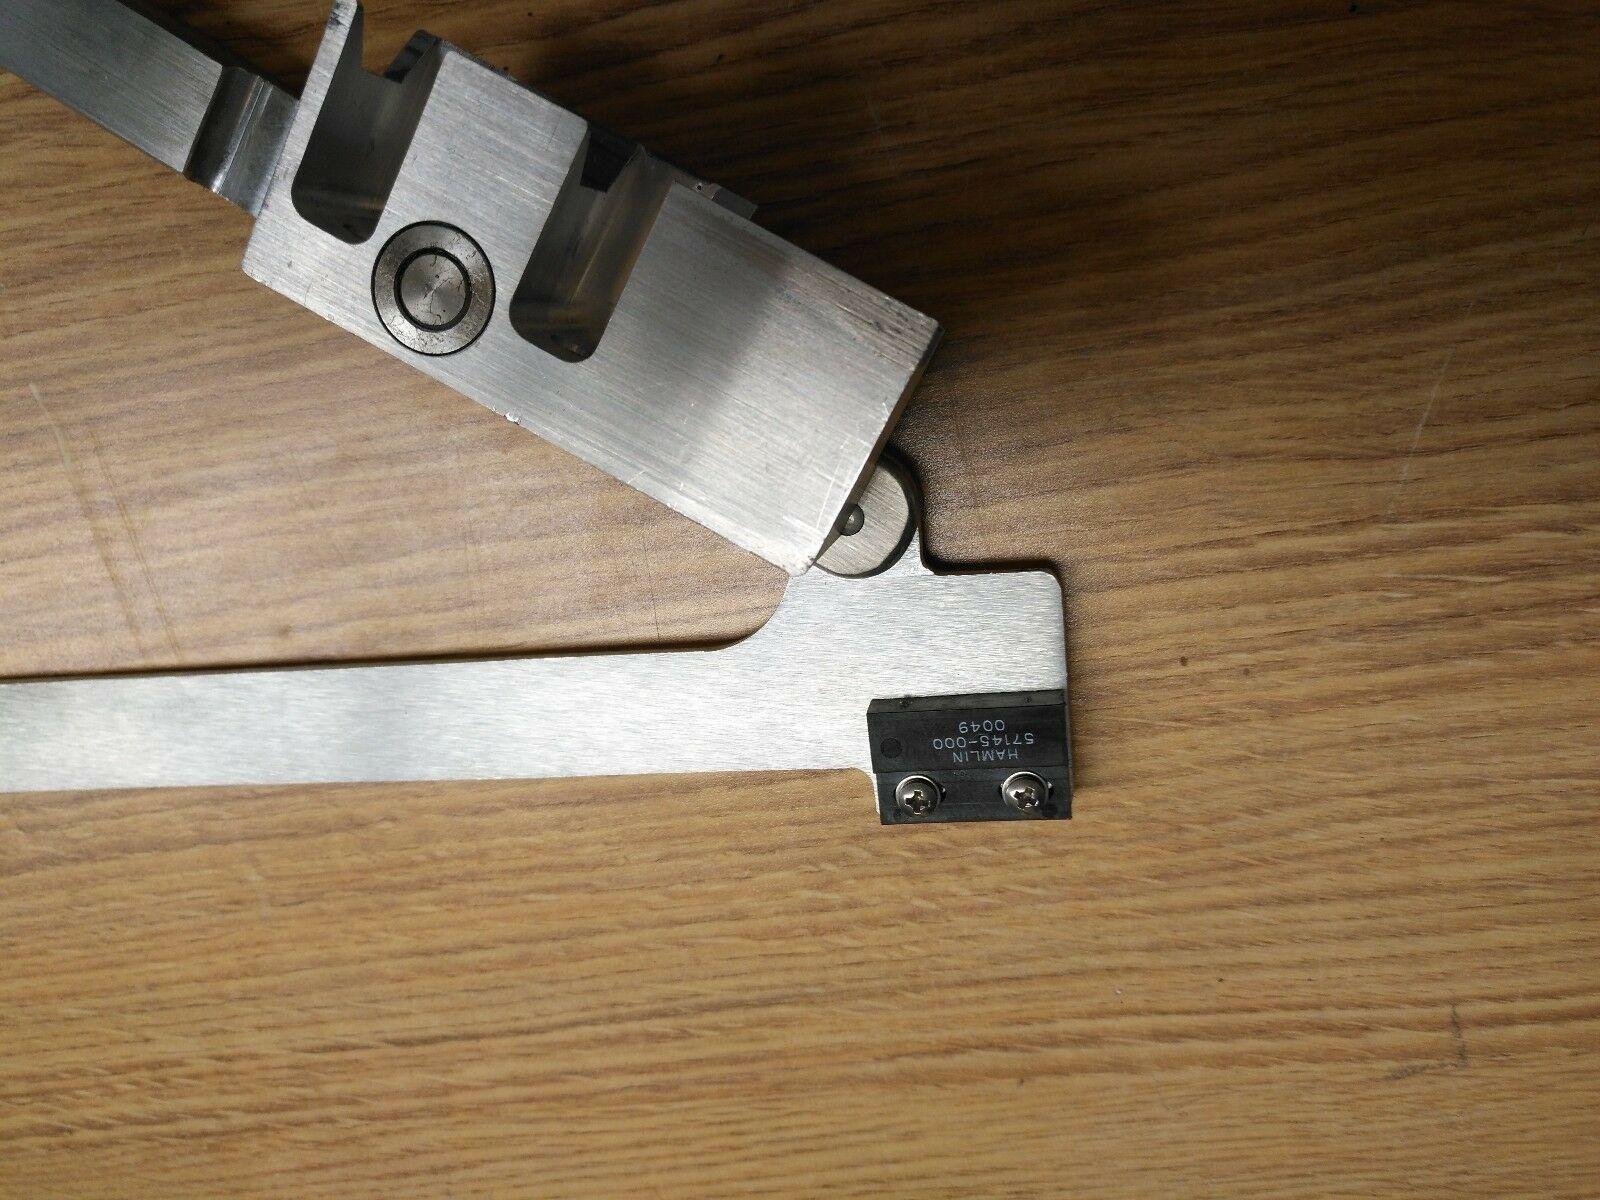 Perkin Elmer Elan 9000 Parts with Proximity Sensor for ICP-MS